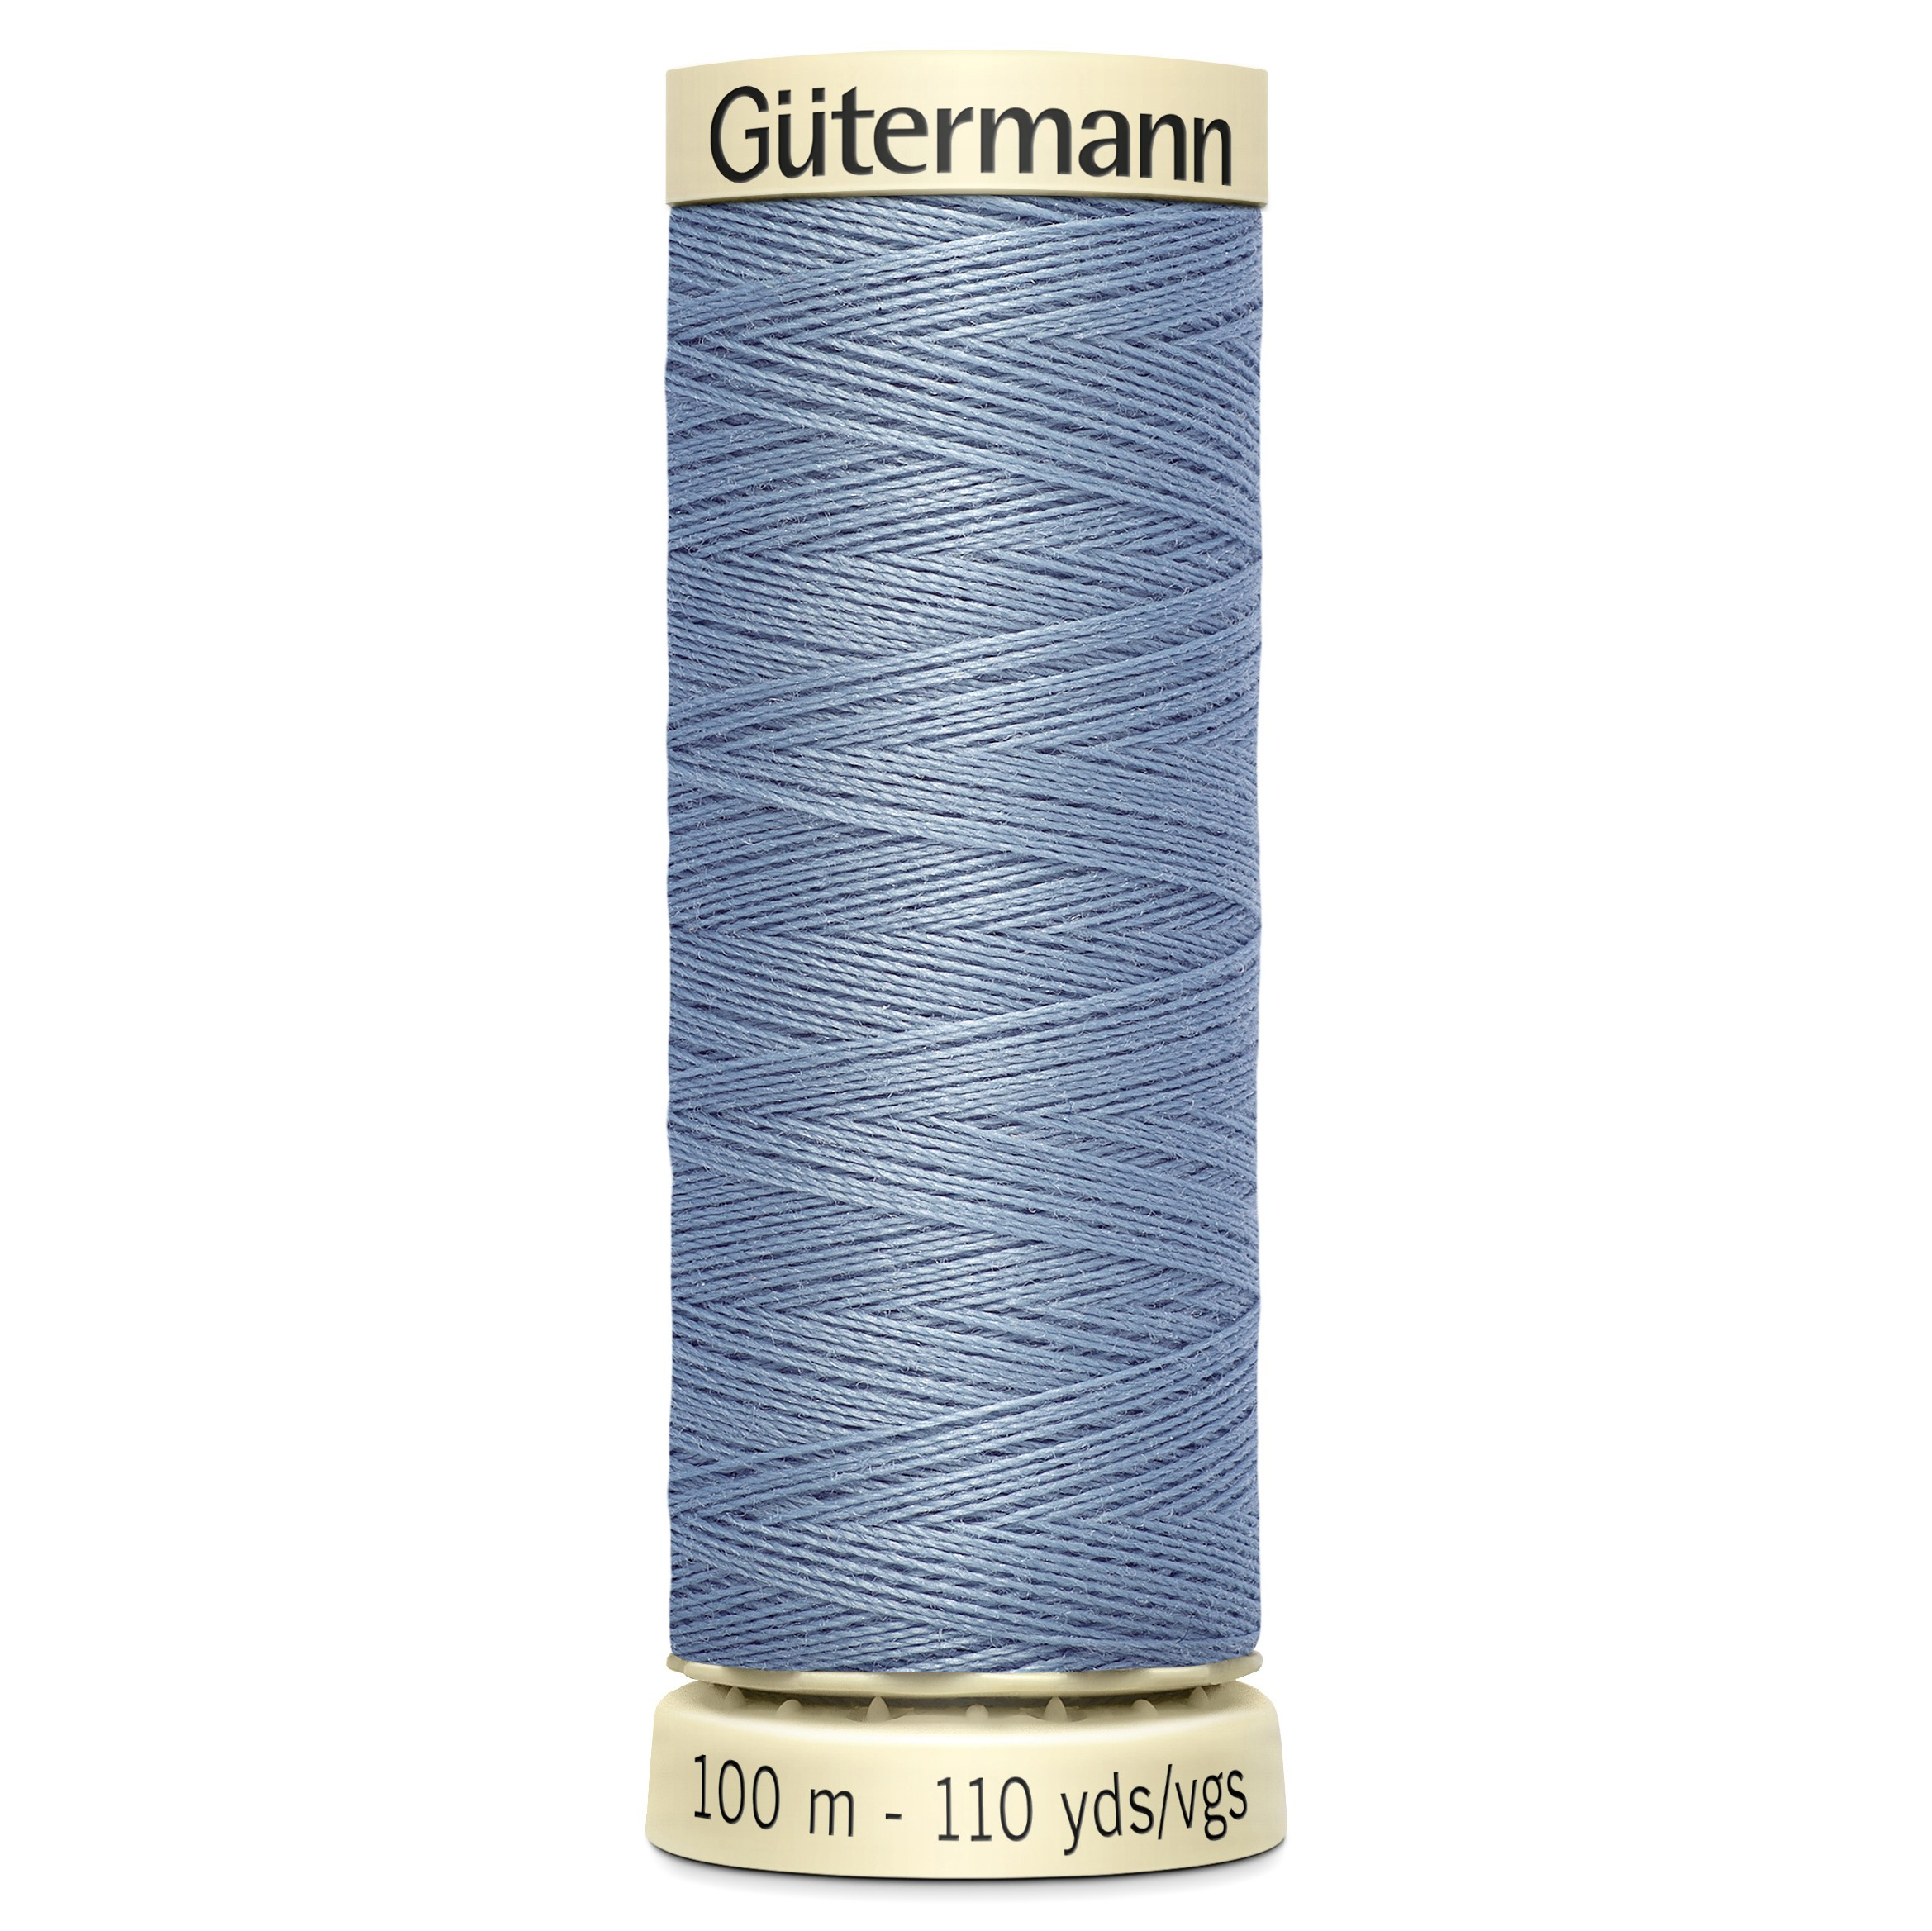 100m Gutermann Sew-all Thread 213